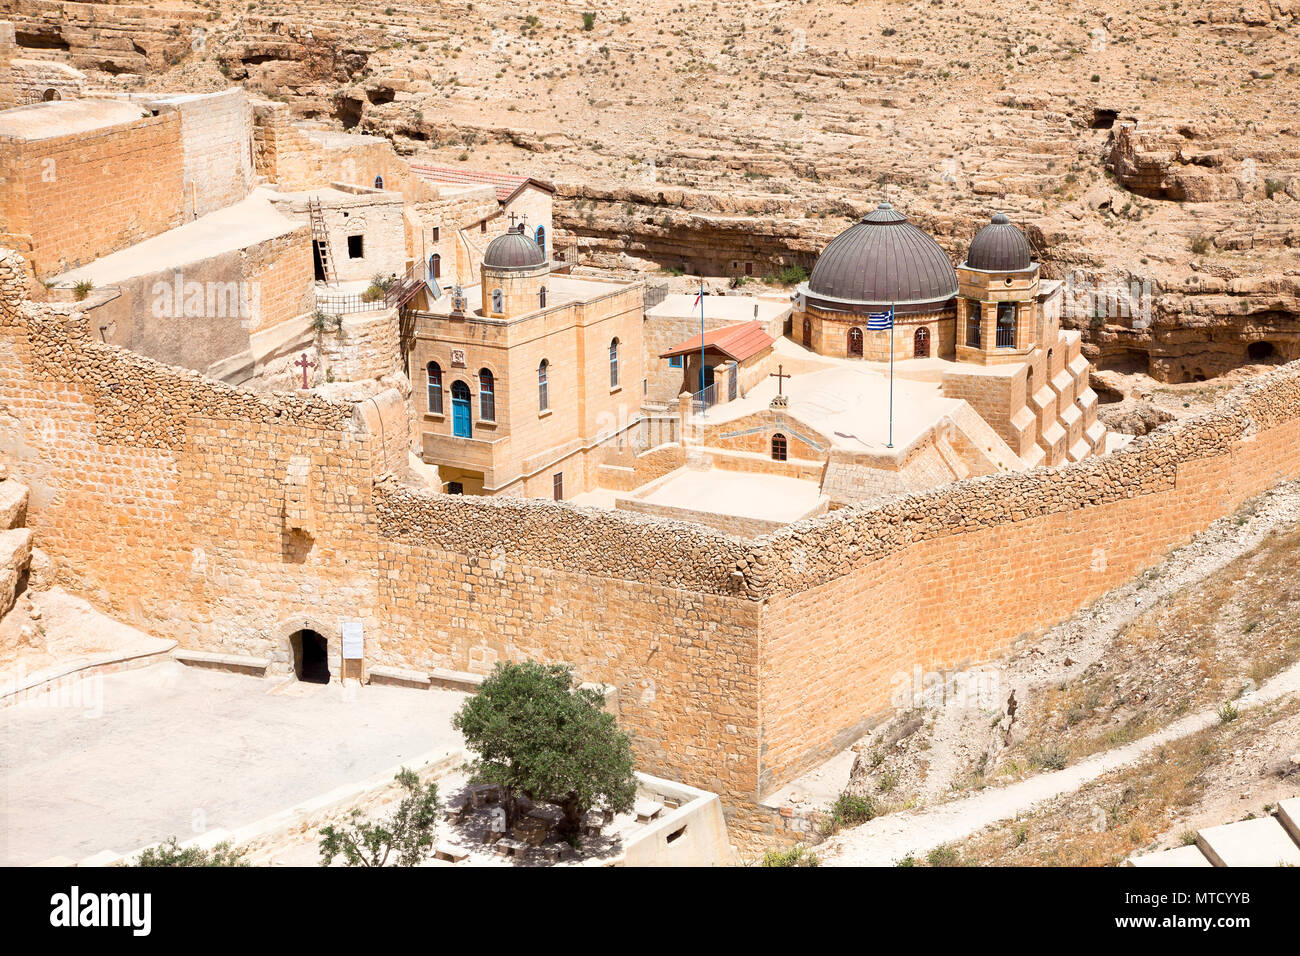 Greek Orthodox monastery Great Lavra of St. Sabbas the Sanctified (Mar Saba) in Judean desert. Palestine, Israel. Stock Photo